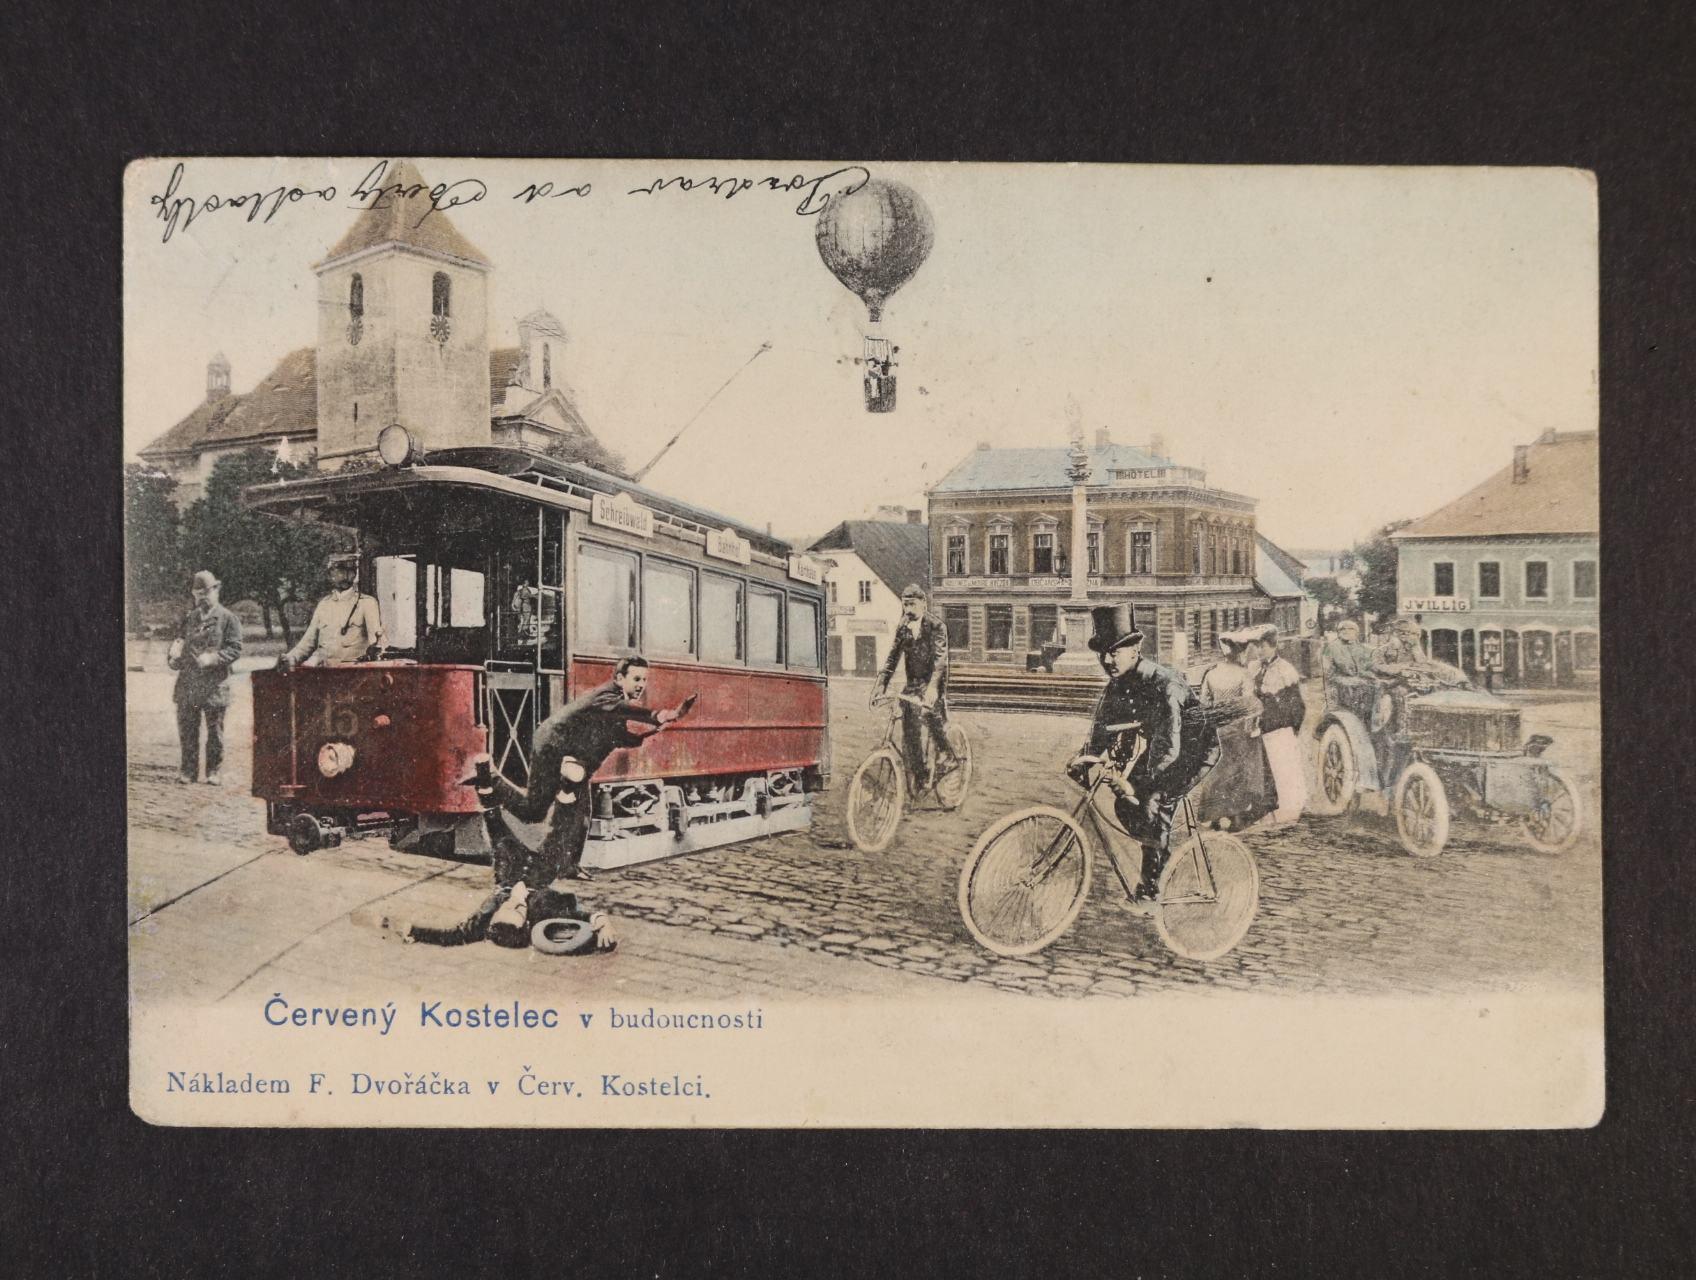 Červený Kostelec - bar. koláž použitá 1905, dobrá kvalita